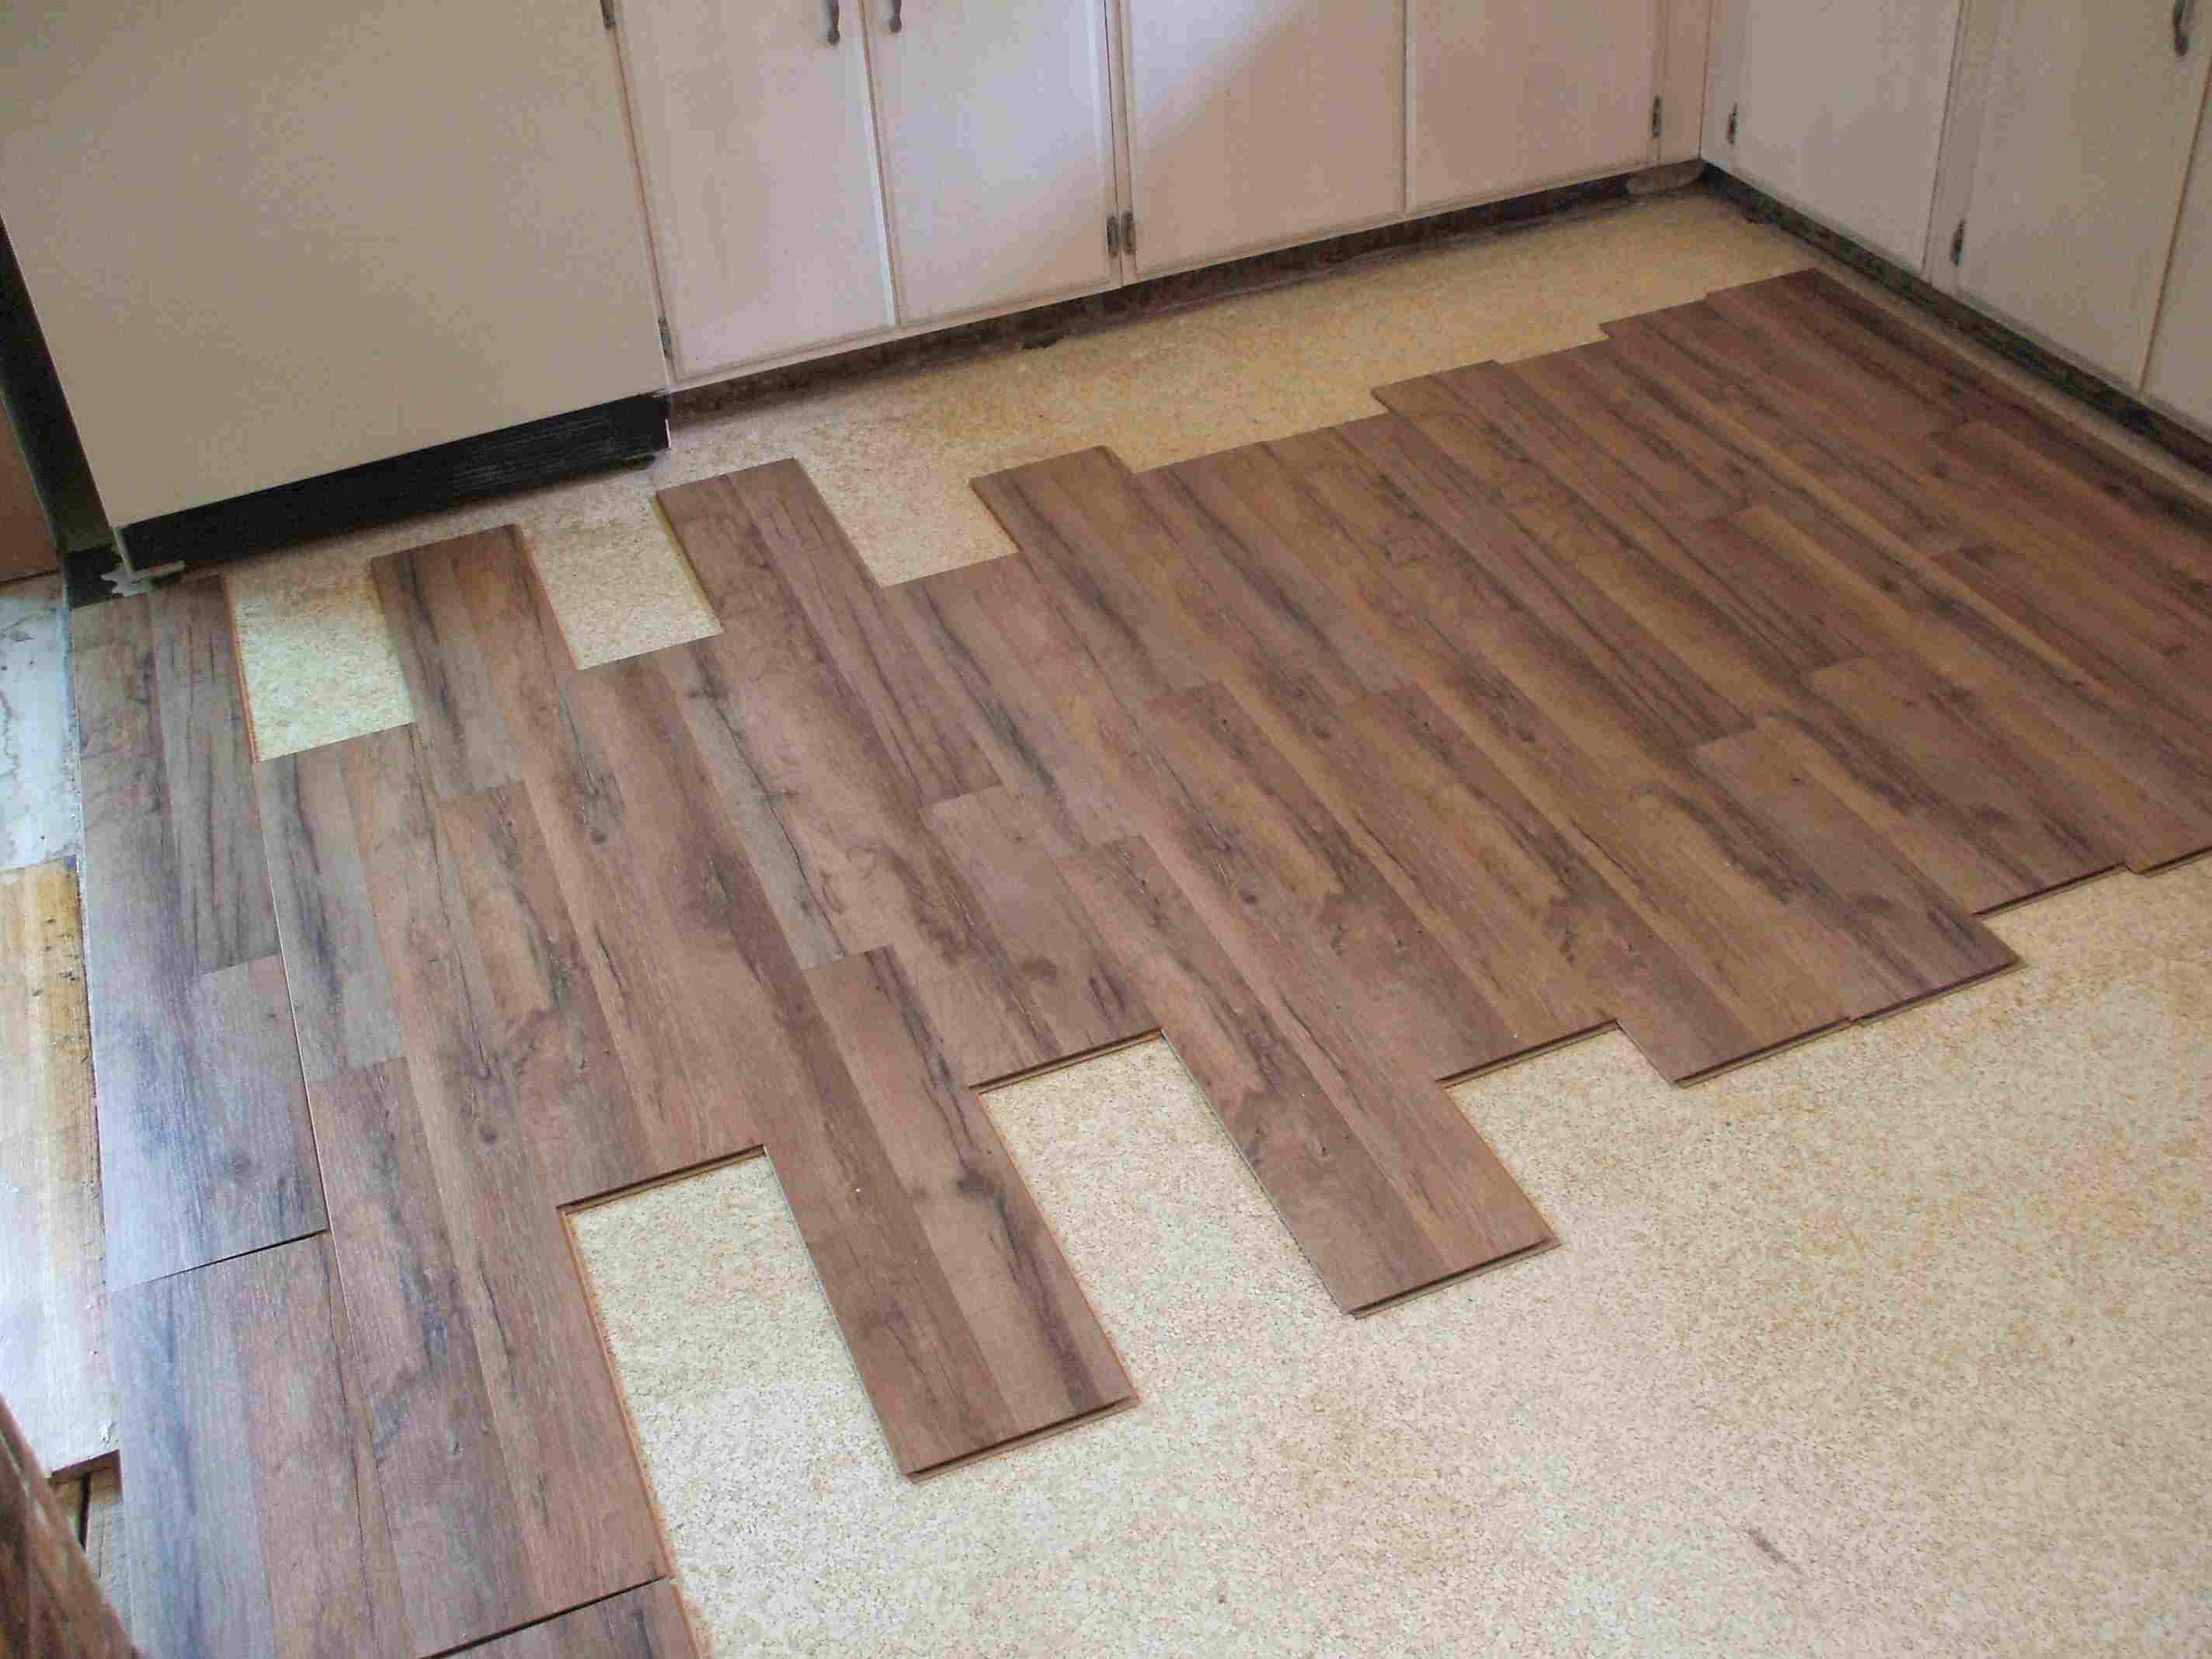 9 16 hardwood flooring of laminate flooring installation made easy pertaining to installing laminate eyeballing layout 56a49d075f9b58b7d0d7d693 jpg